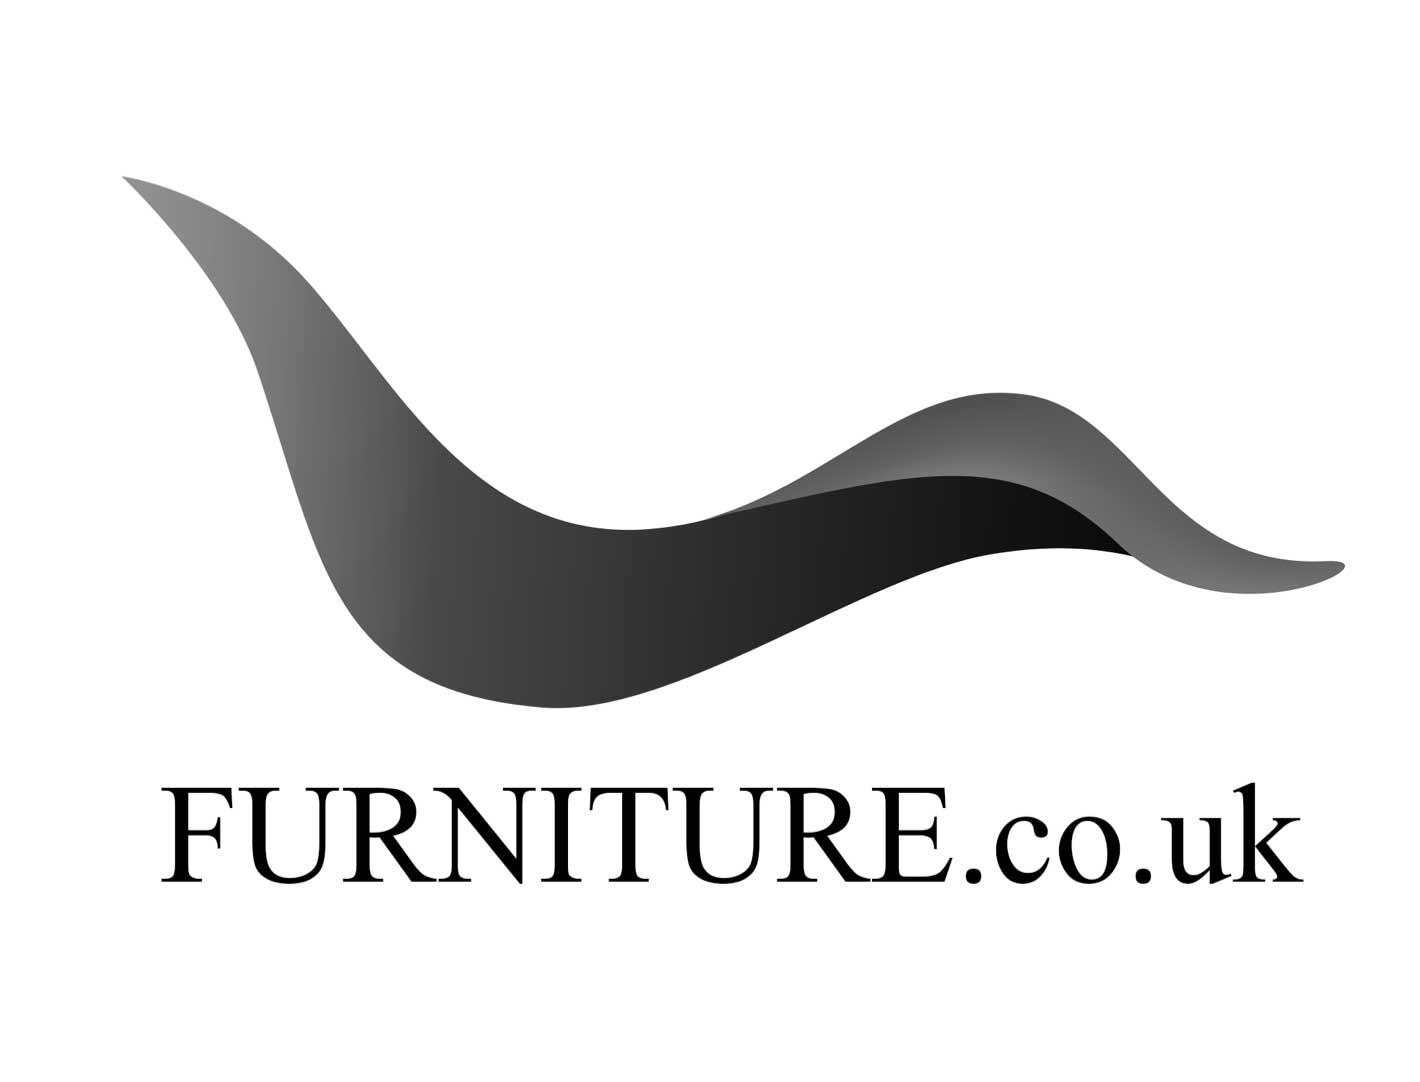 Furniture.co.uk